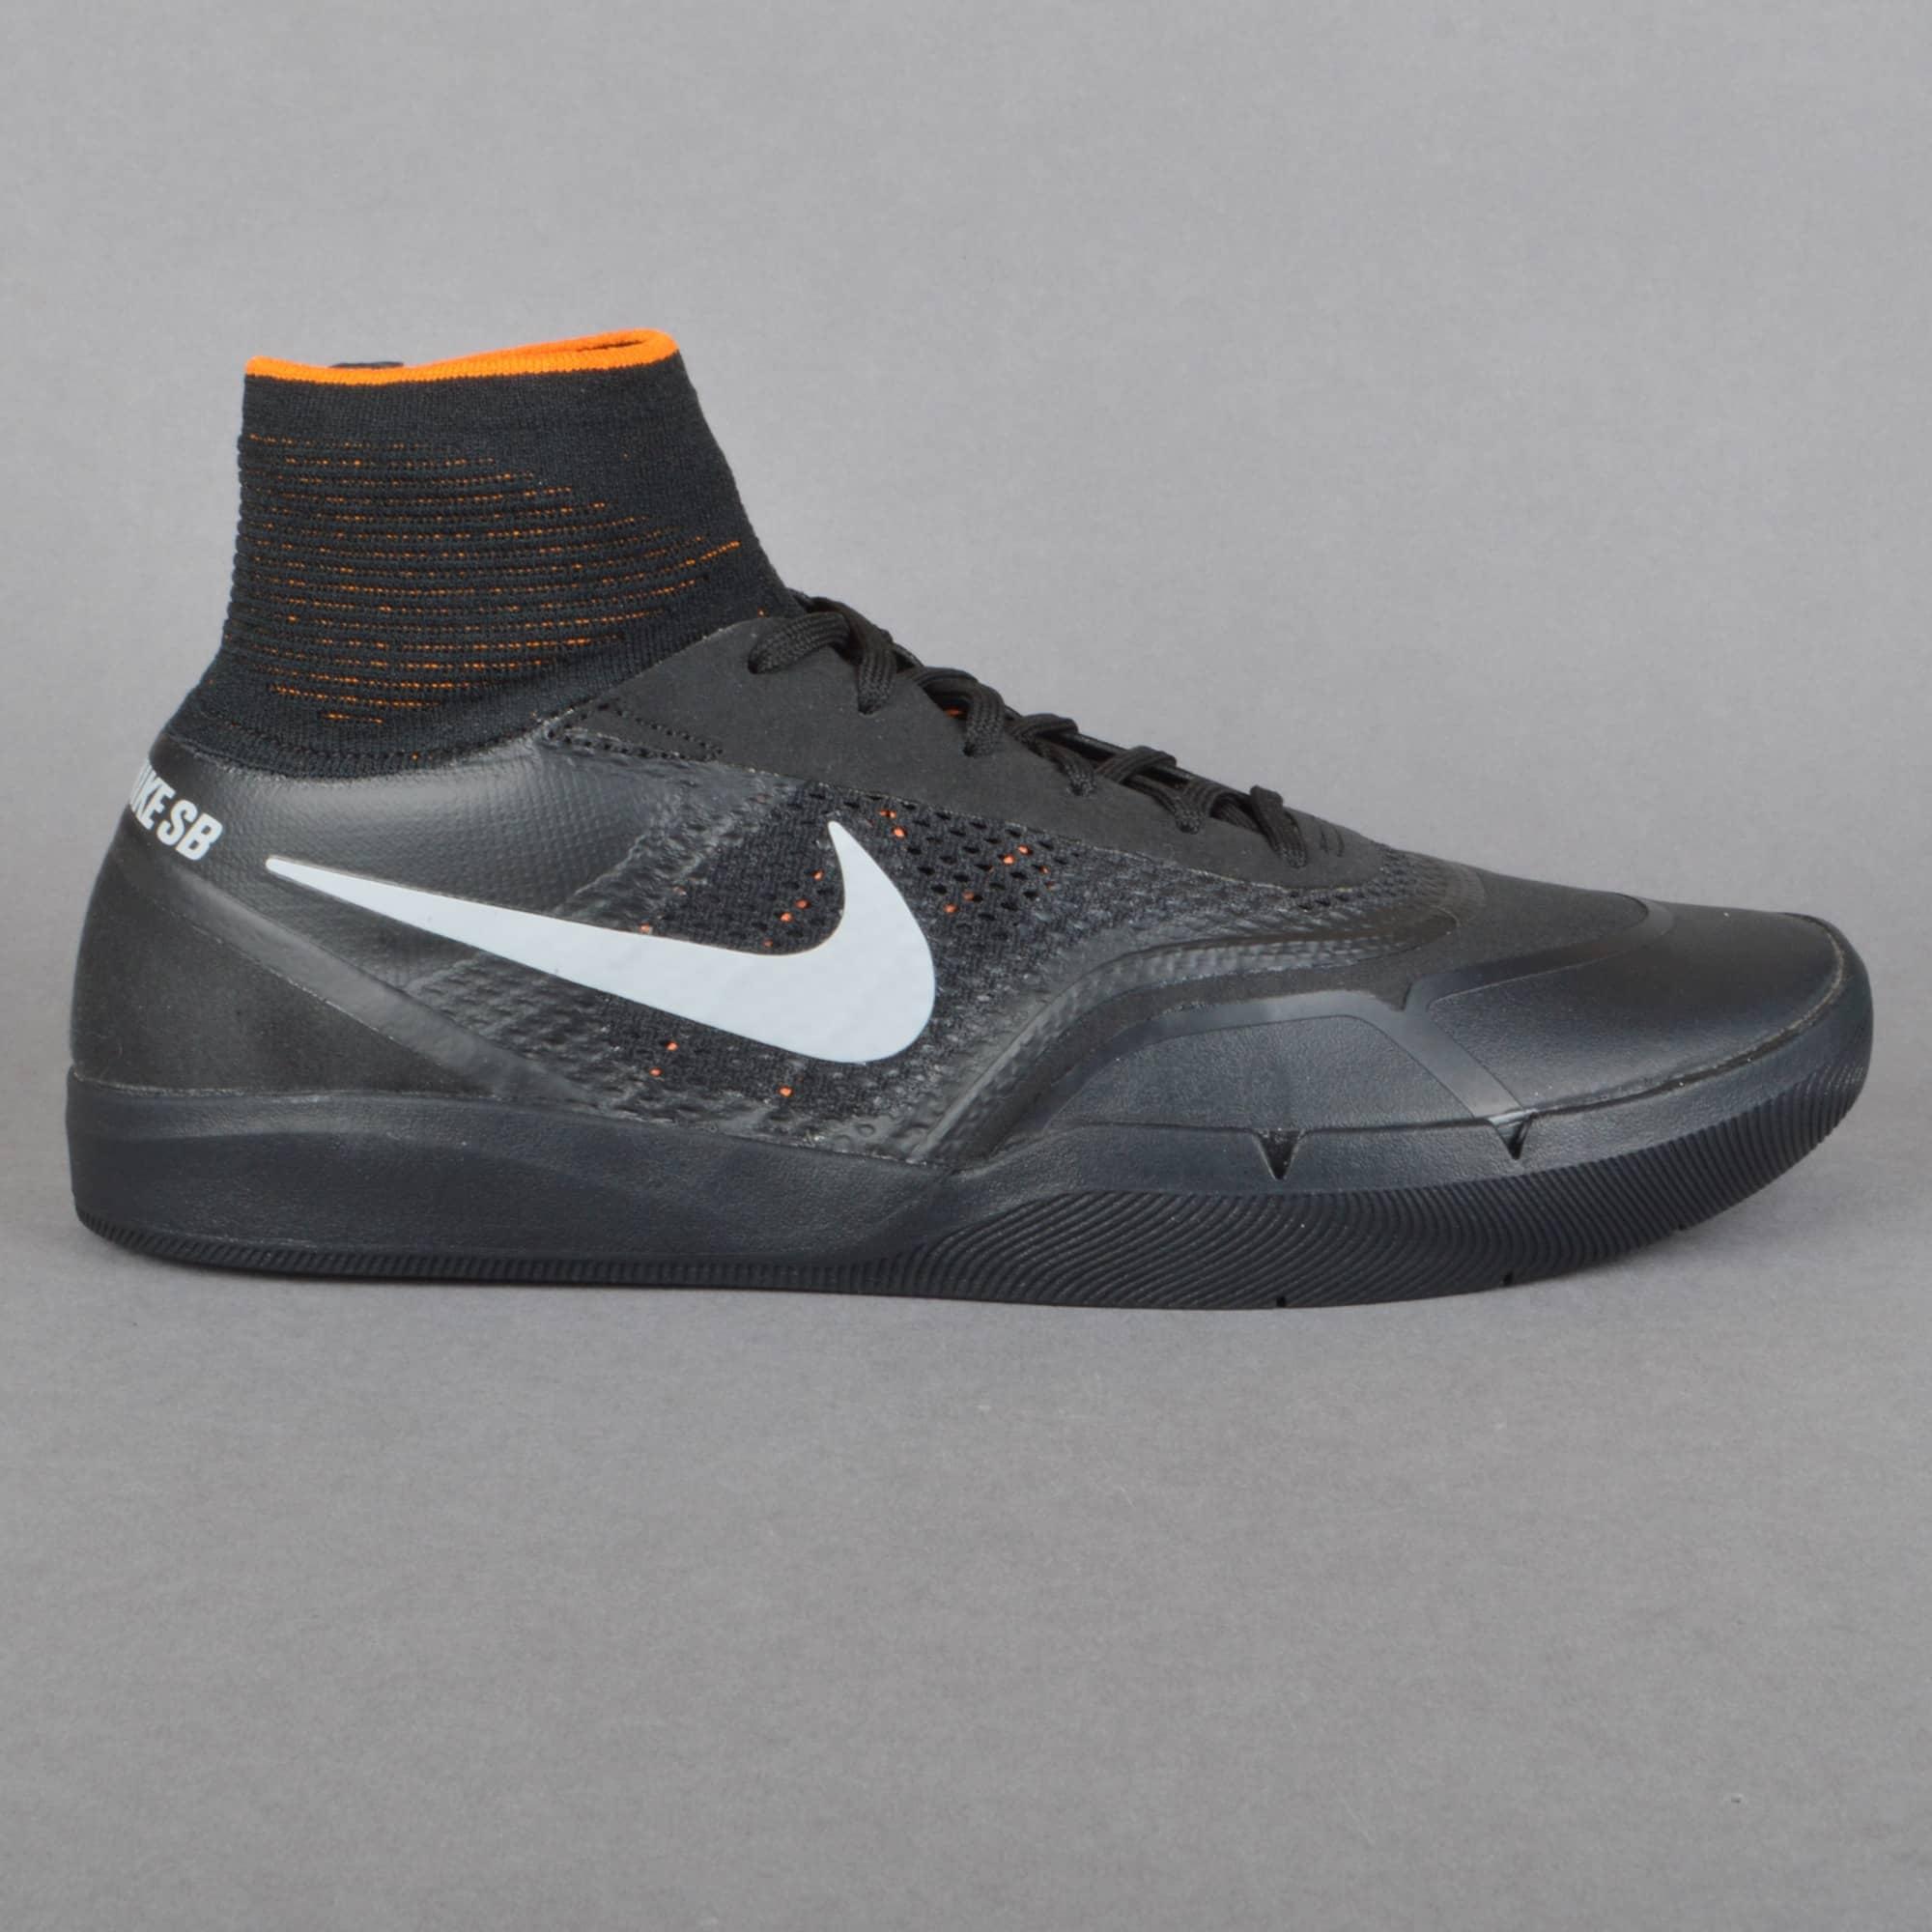 Repetido escapar por inadvertencia  Nike SB Hyperfeel Koston 3 XT Skate Shoes - Black/Silver-Clay Orange -  SKATE SHOES from Native Skate Store UK